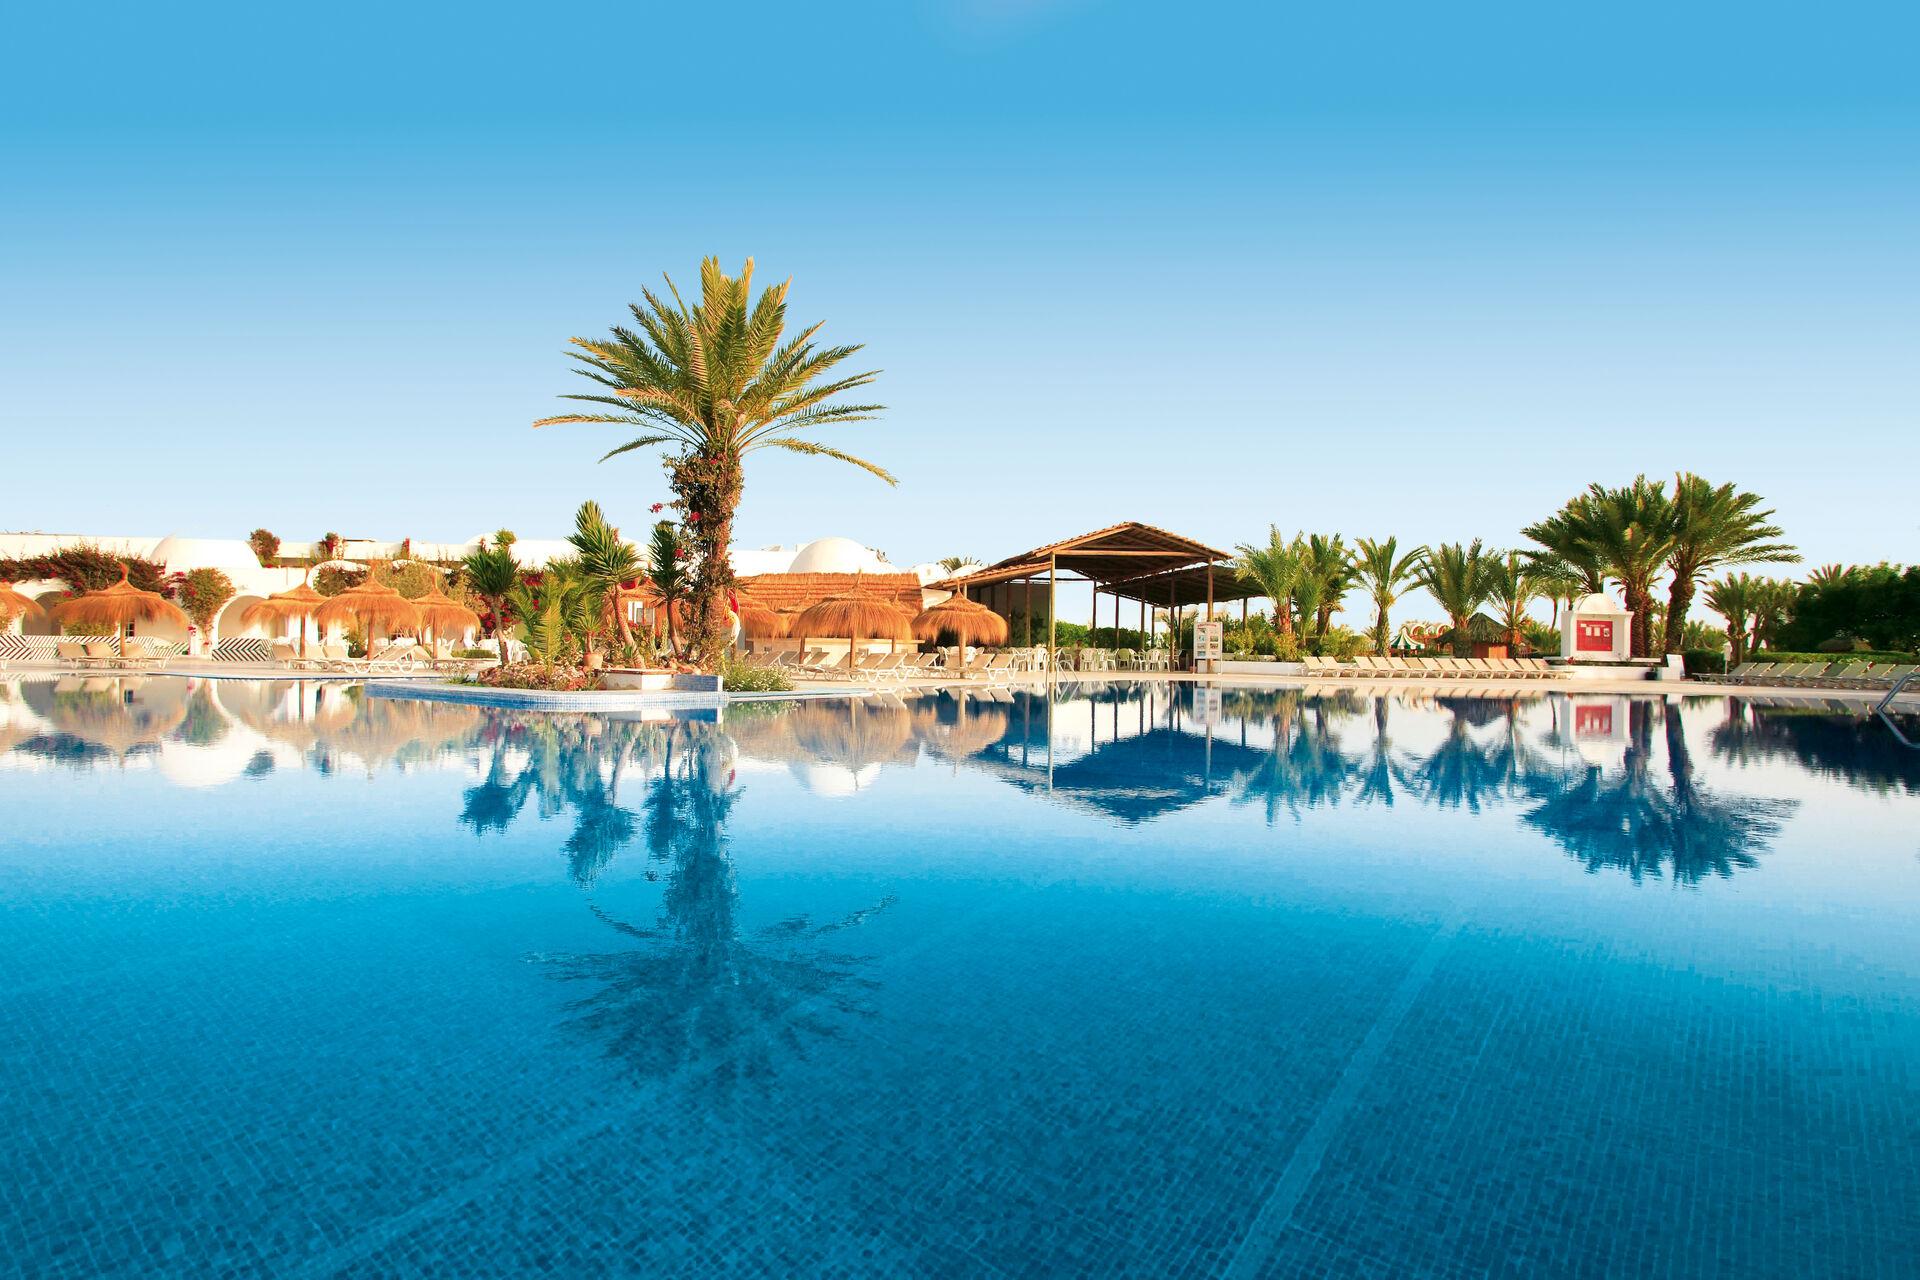 Séjour Tunisie - Seabel Rym Beach  - 4*